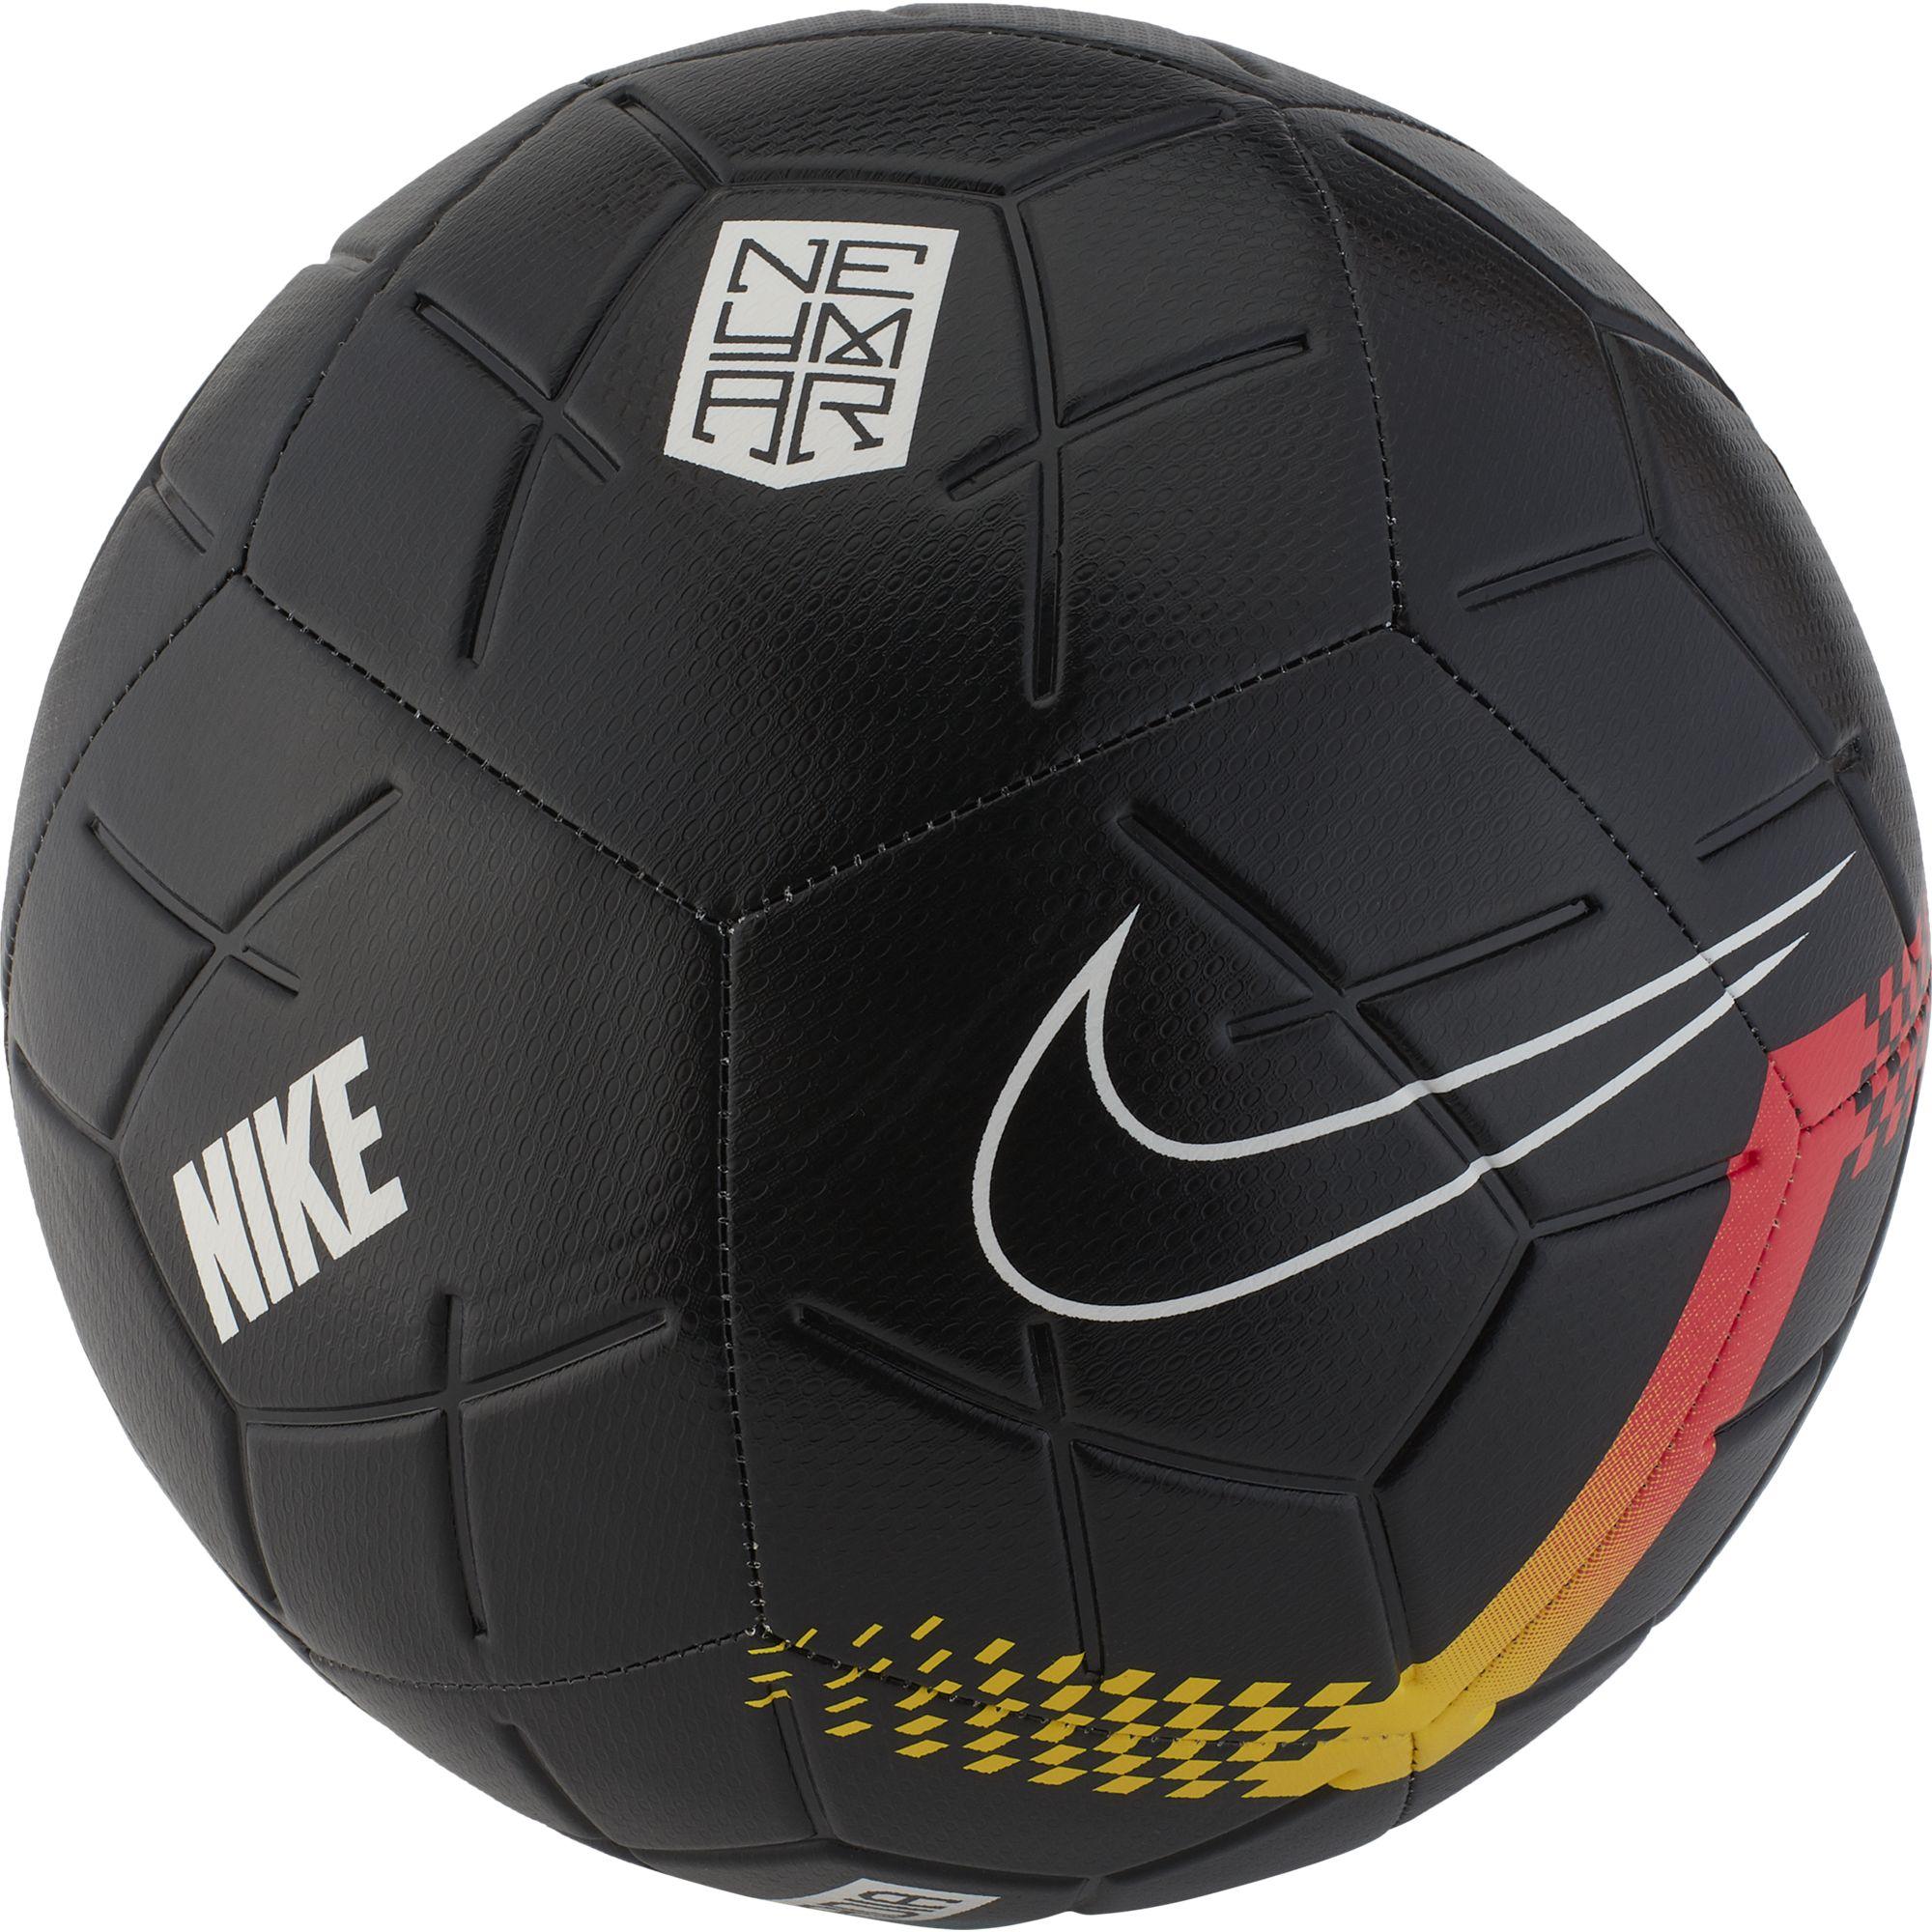 Neymar Strike Soccer Ball, Black/Red, swatch